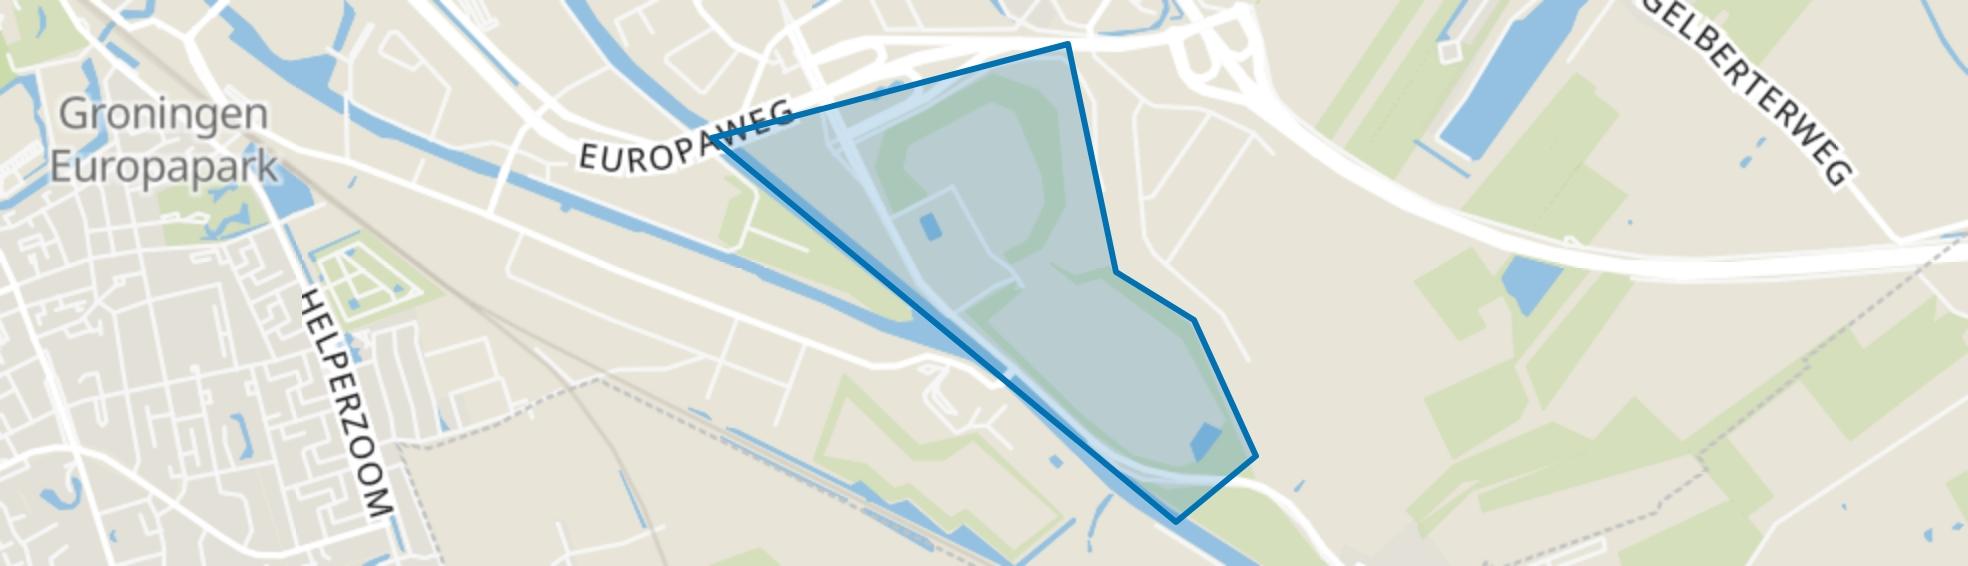 Stainkoel'n, Groningen map